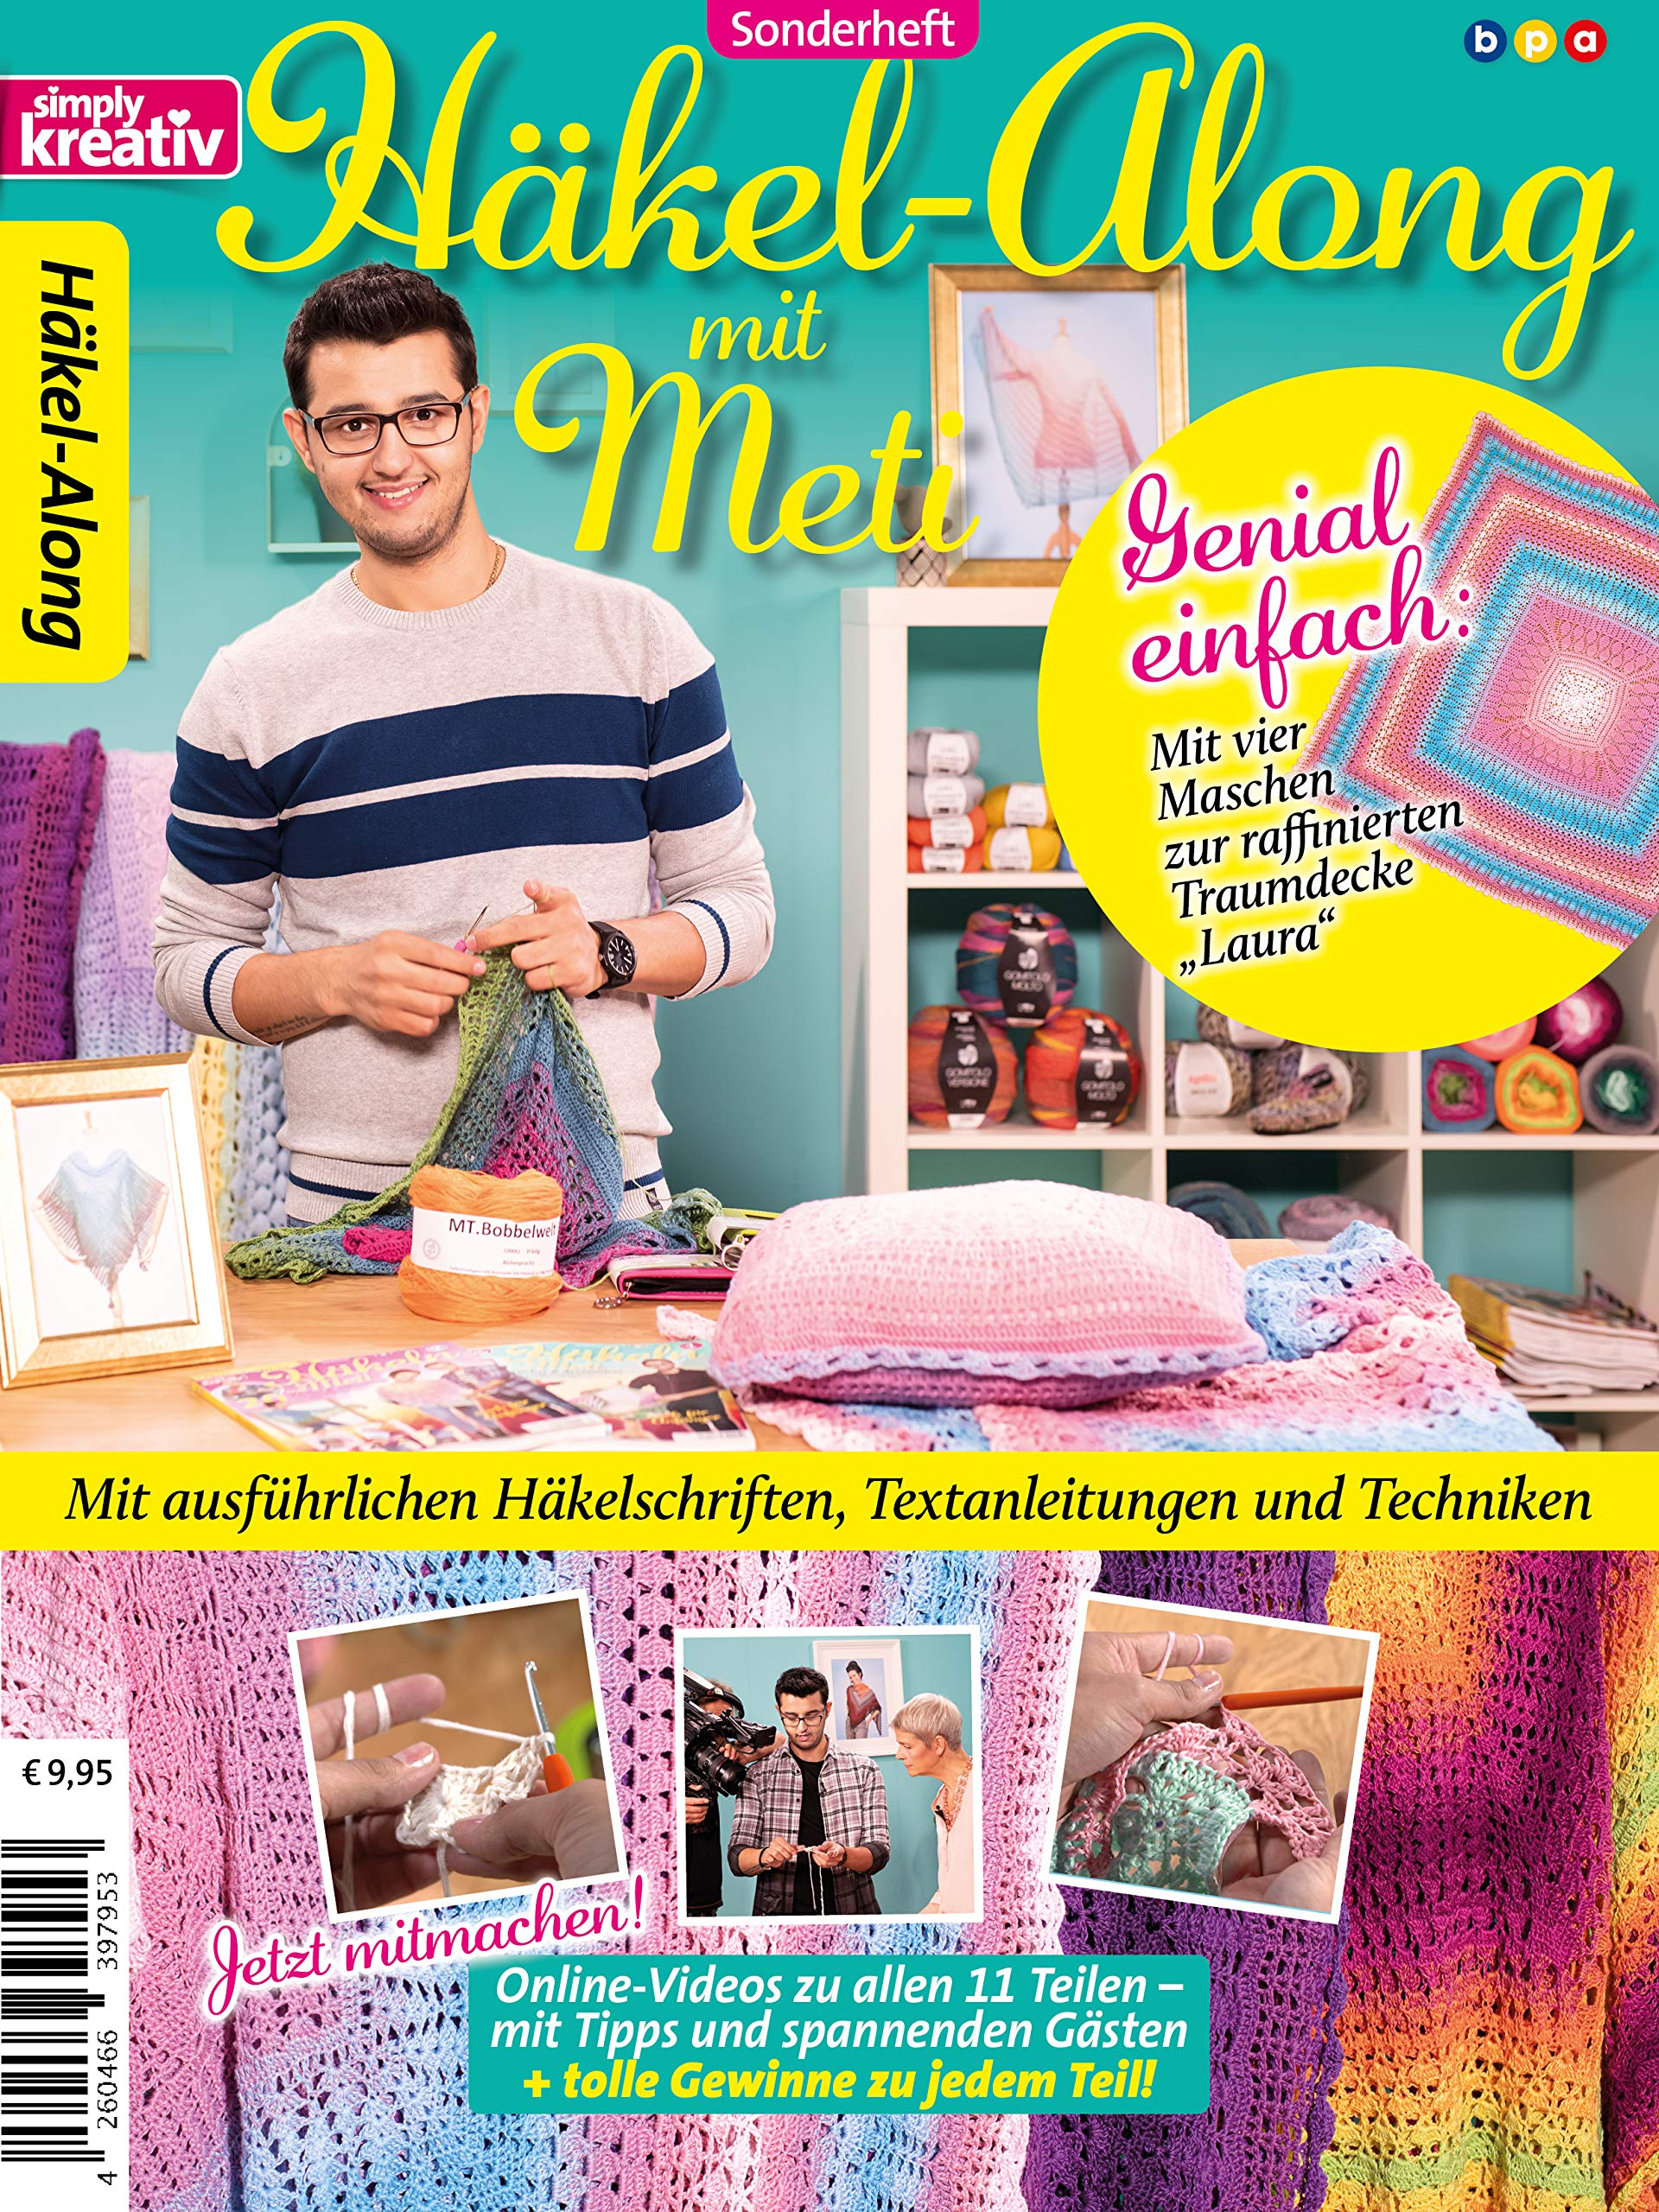 1    2019 20 Tücher/&Accessoires simply kreativ Sonderheft Häkeln mit Meti  Vol